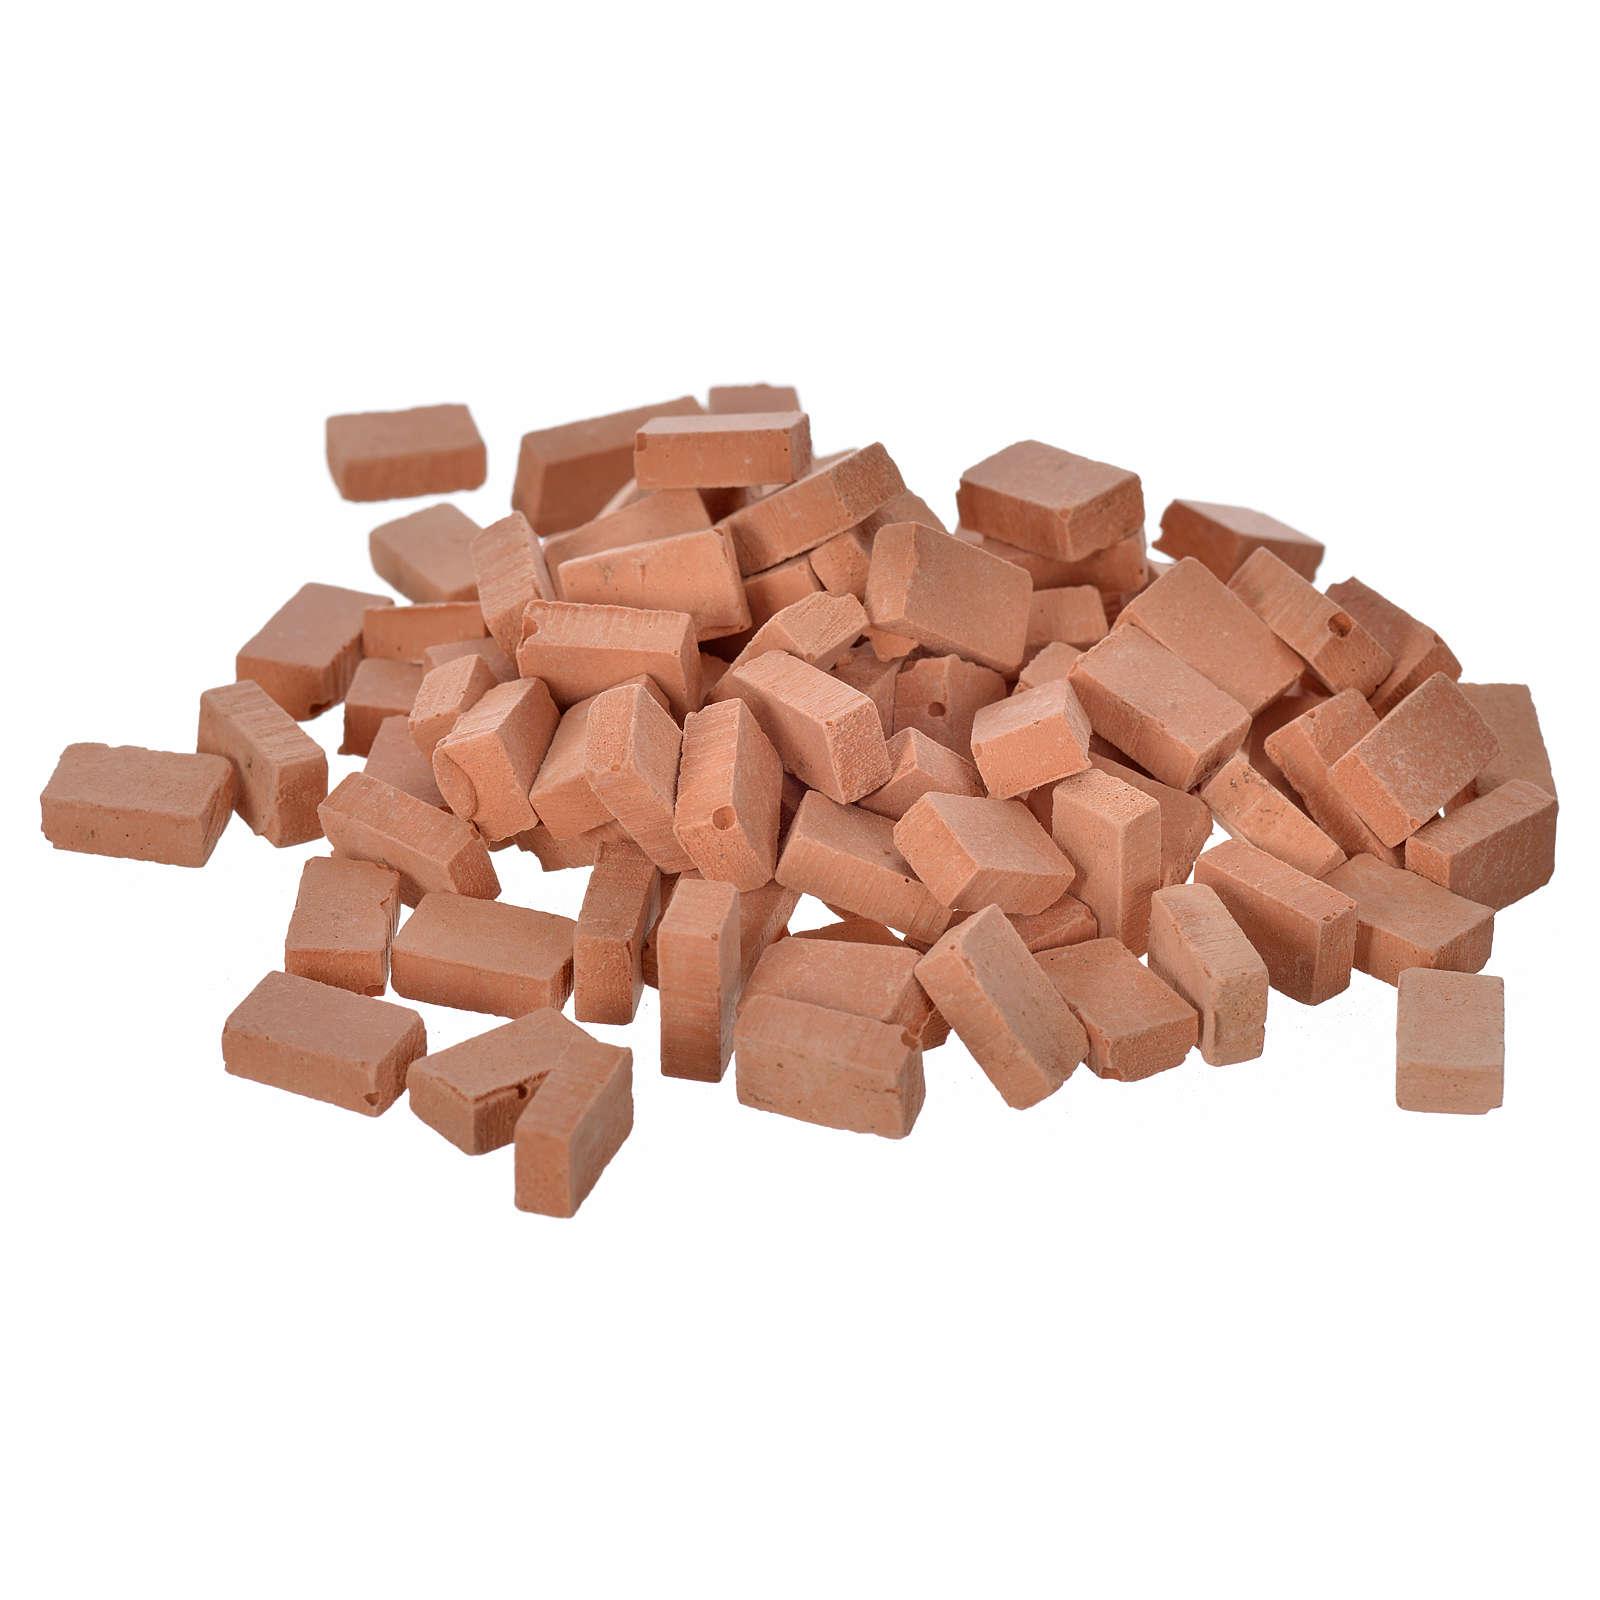 Mattoni resina mm 10x7 set 100 pz. 4